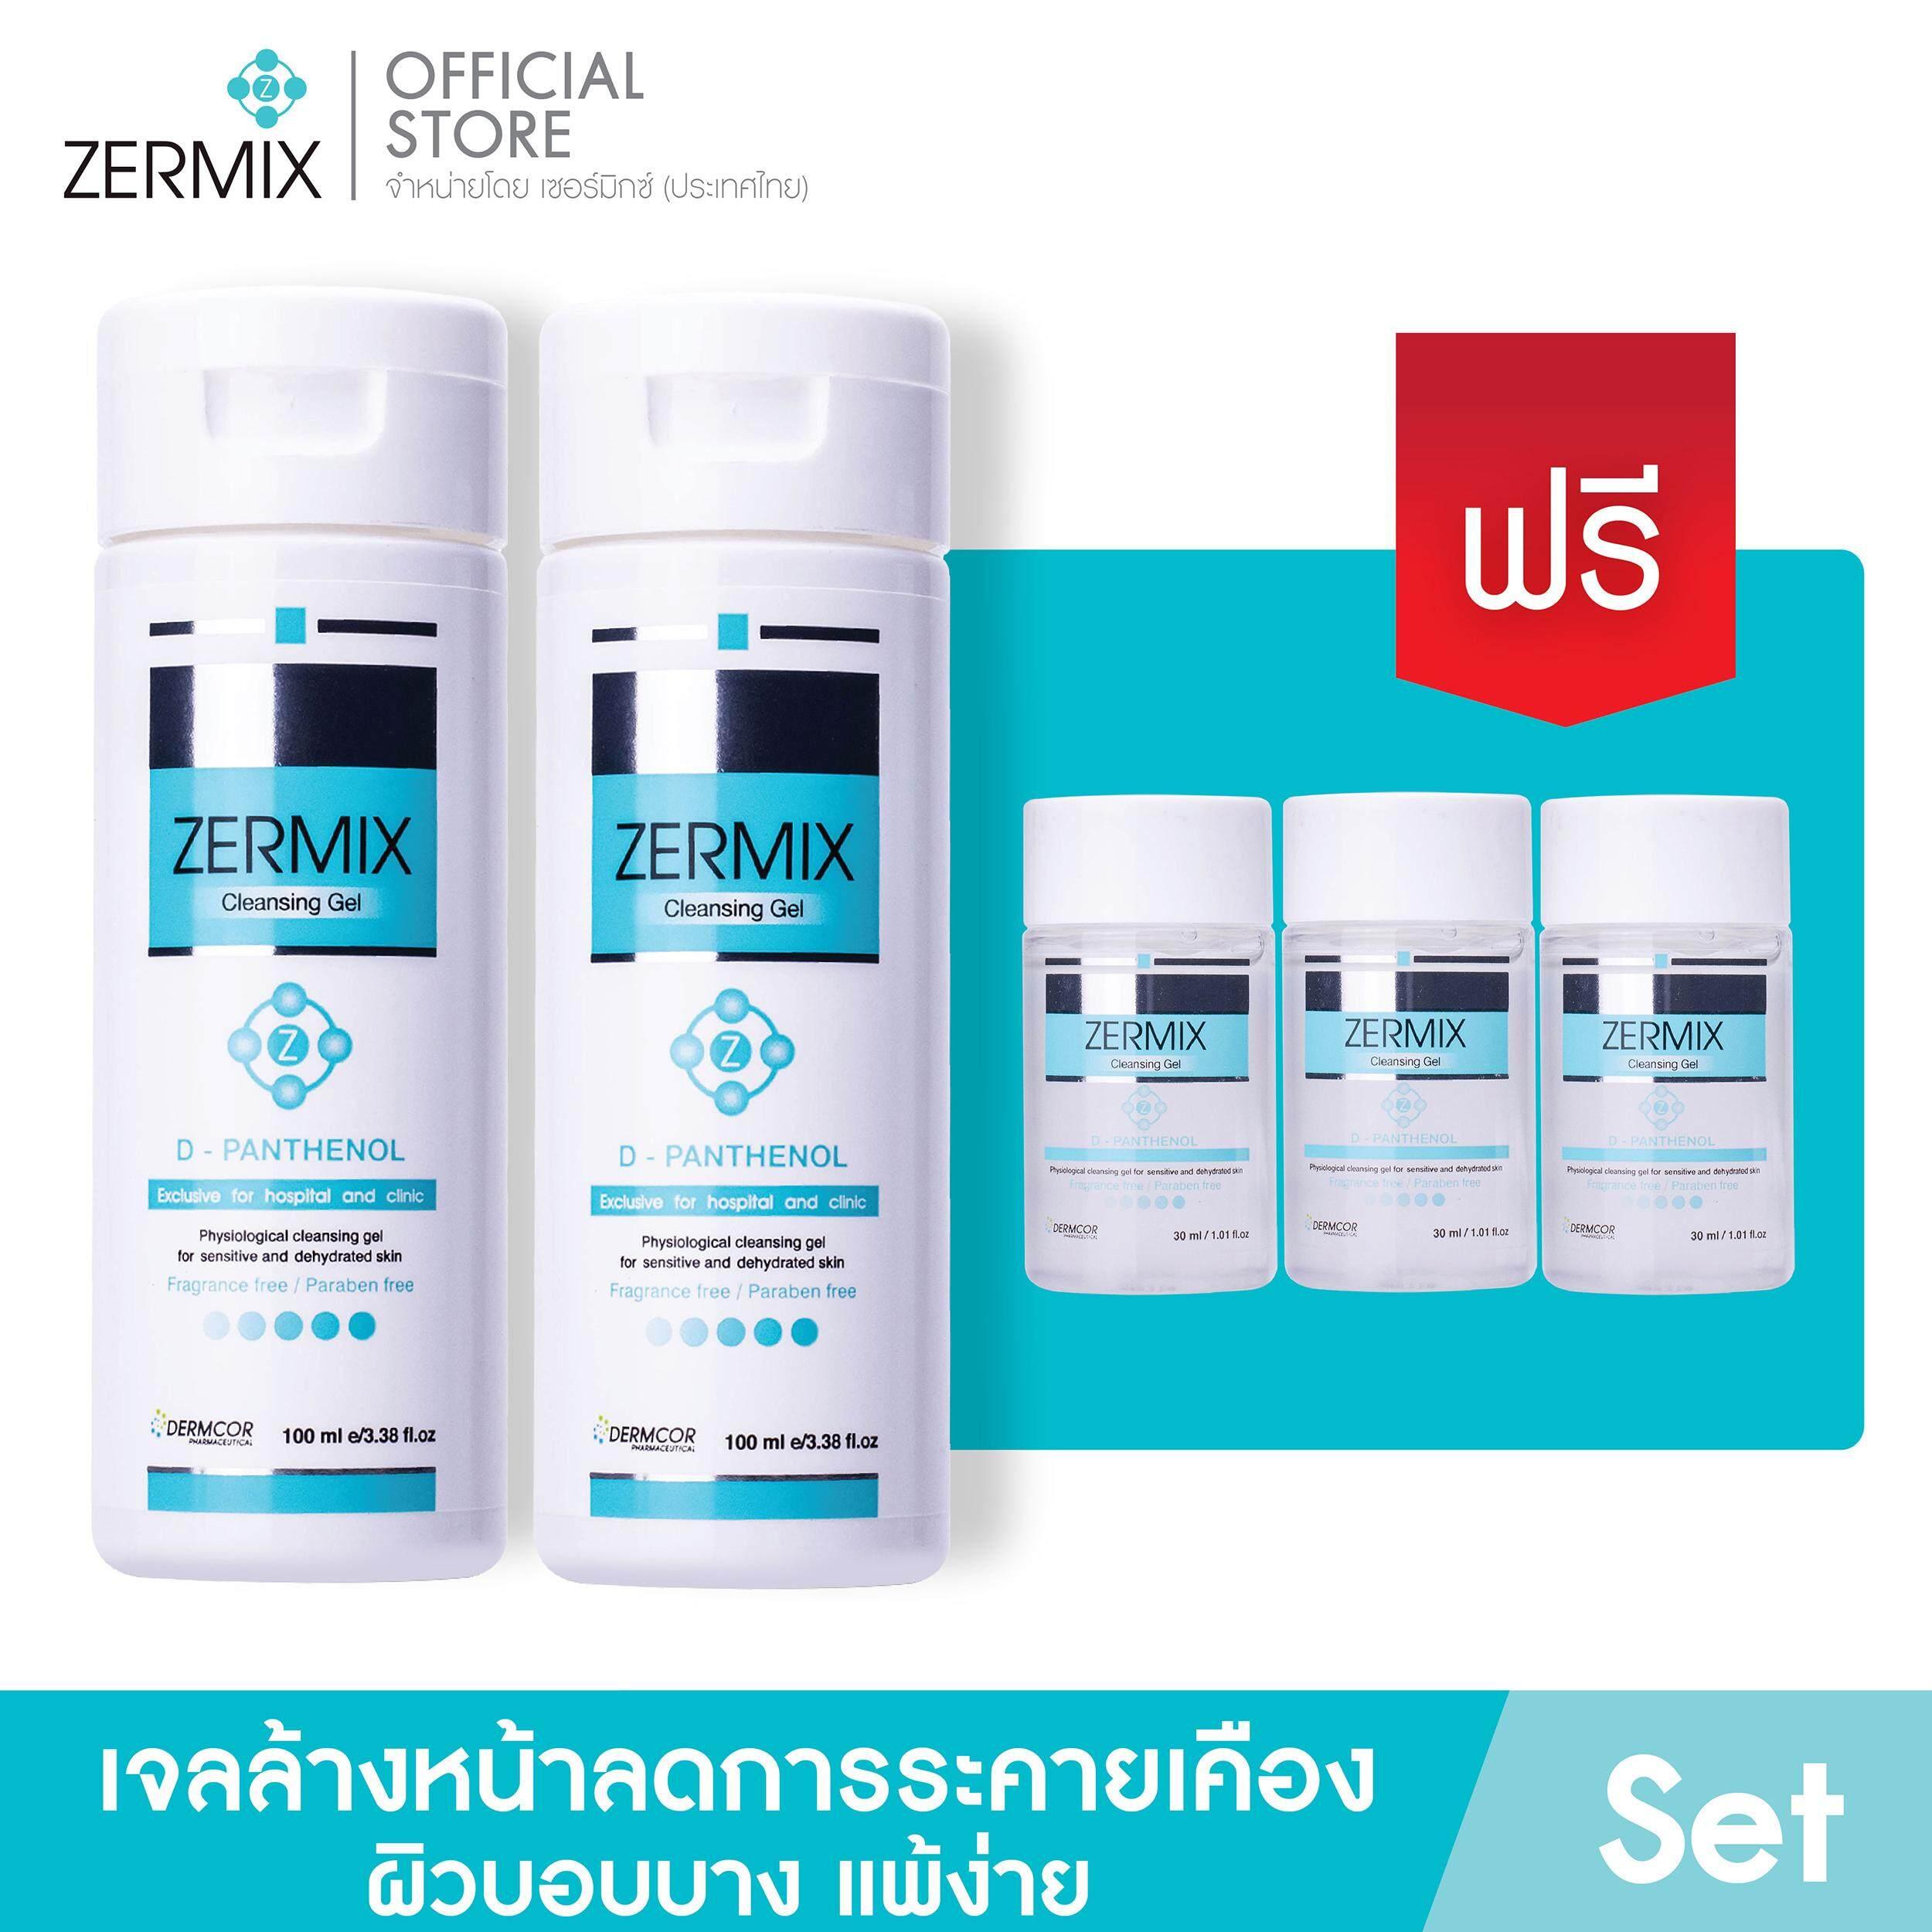 [free 30 Ml X 3 ] Zermix Cleansing Gel 100 Ml 2 กล่อง เจลล้างหน้า เจลล้างหน้าผิวแพ้ง่าย ไม่มีฟอง อ่อนโยน  Cleanser Cleansing โฟมล้างหน้าลดสิว ครีมล้างหน้าลดสิว เจลล้างหน้าผิวขาวใสโฟมล้างหน้าสิว ครีมล้างหน้า โฟมล้างหน้า.